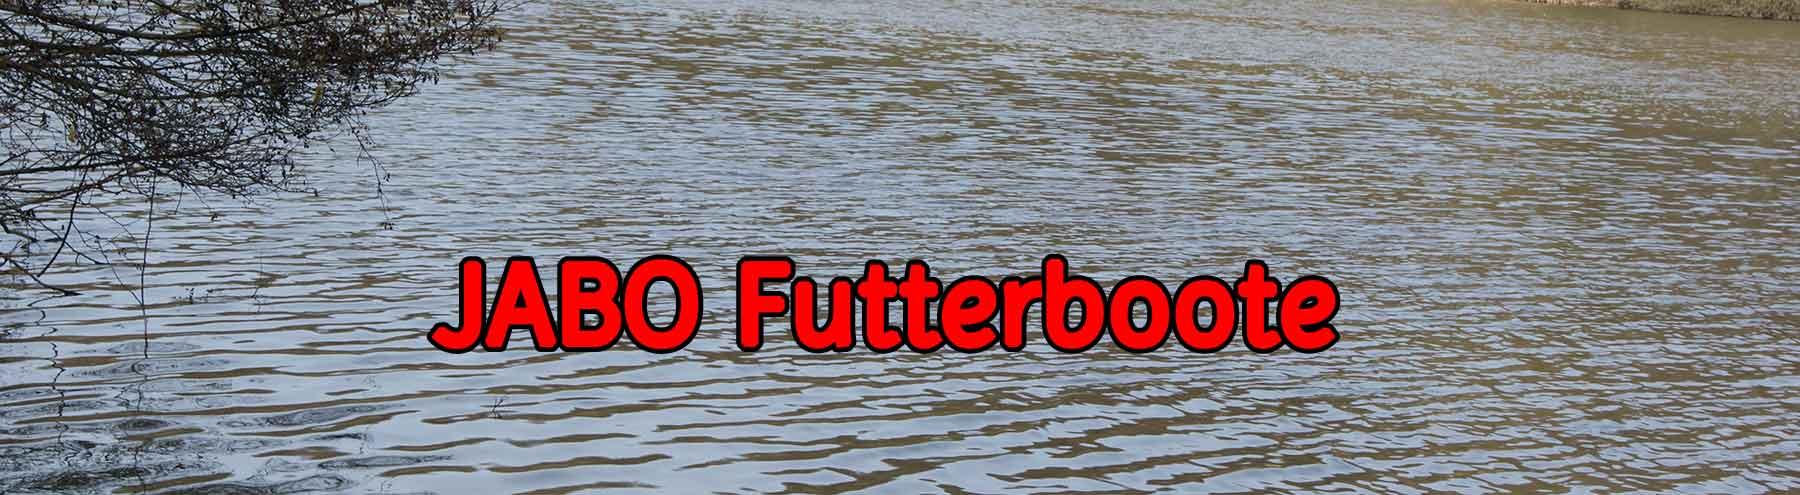 Jabo Futterboote